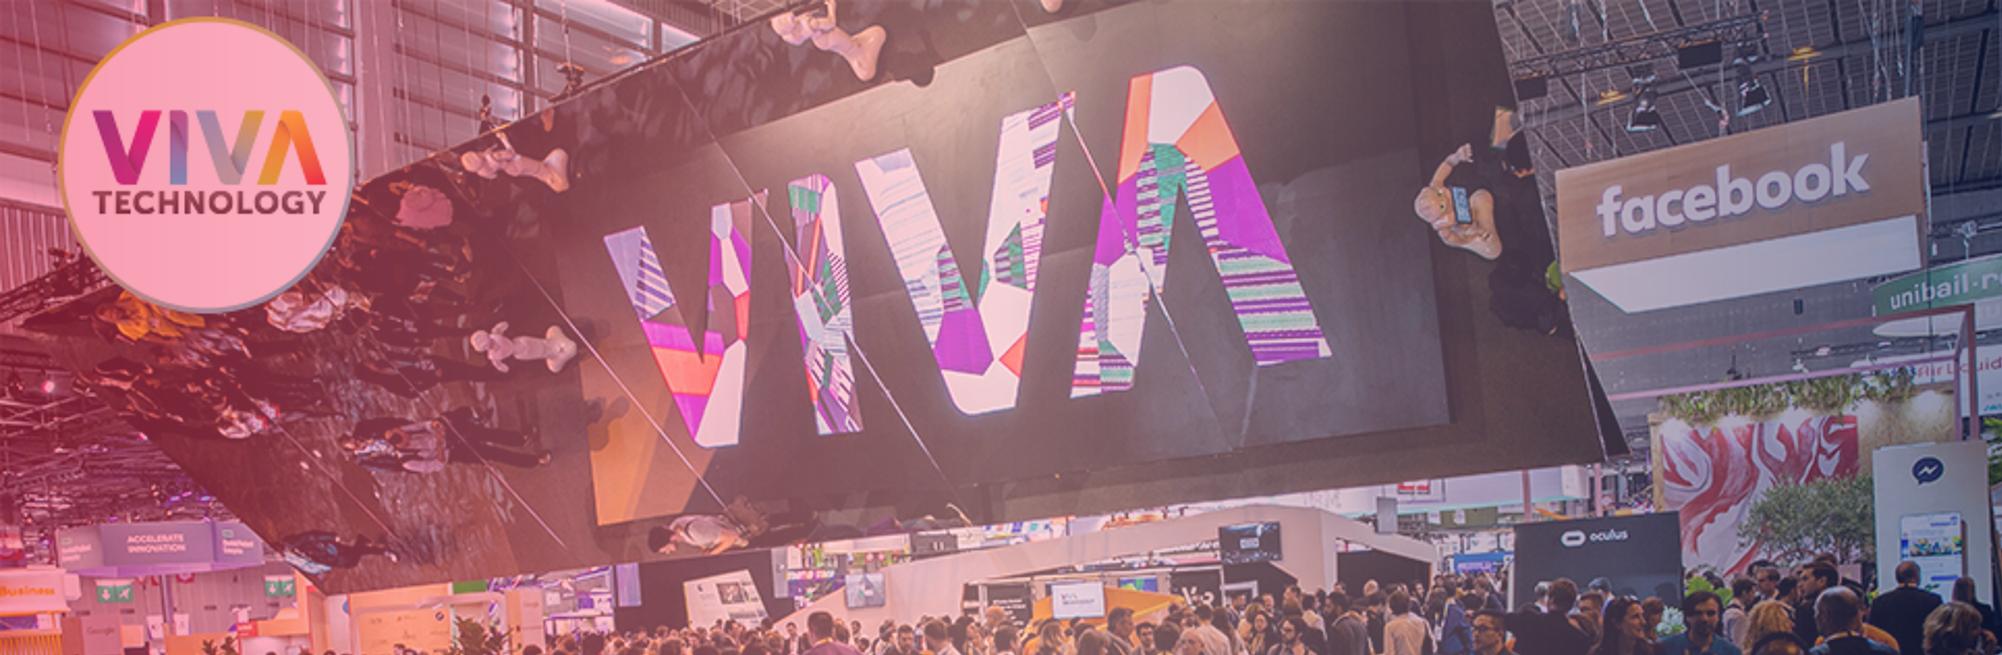 ARAGO Consulting au salon de l'innovation Viva Technology 2018